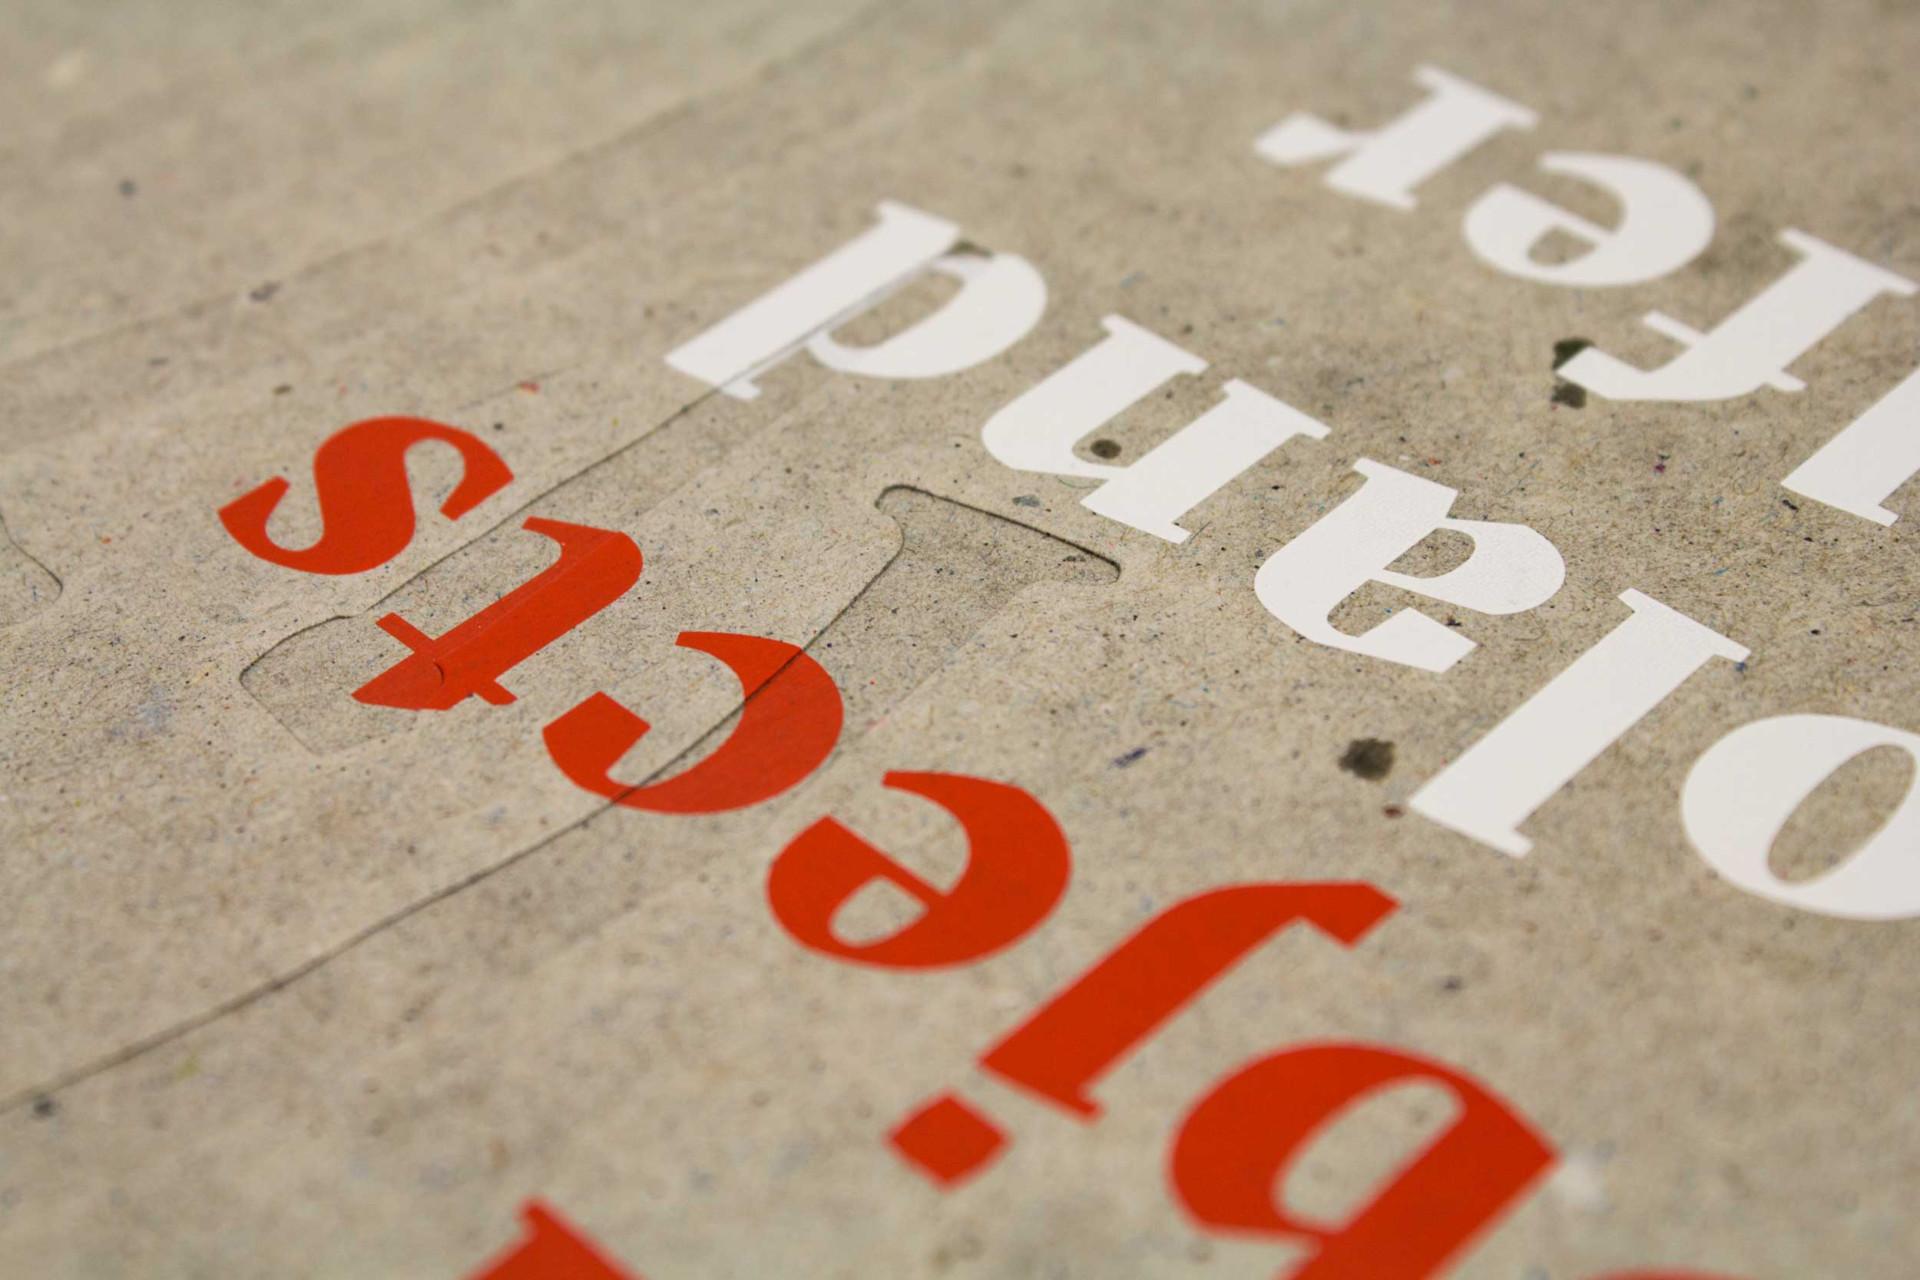 BKVK Nagelobjekte/Nail Objects, Roland Pulfer — Buchgestaltung